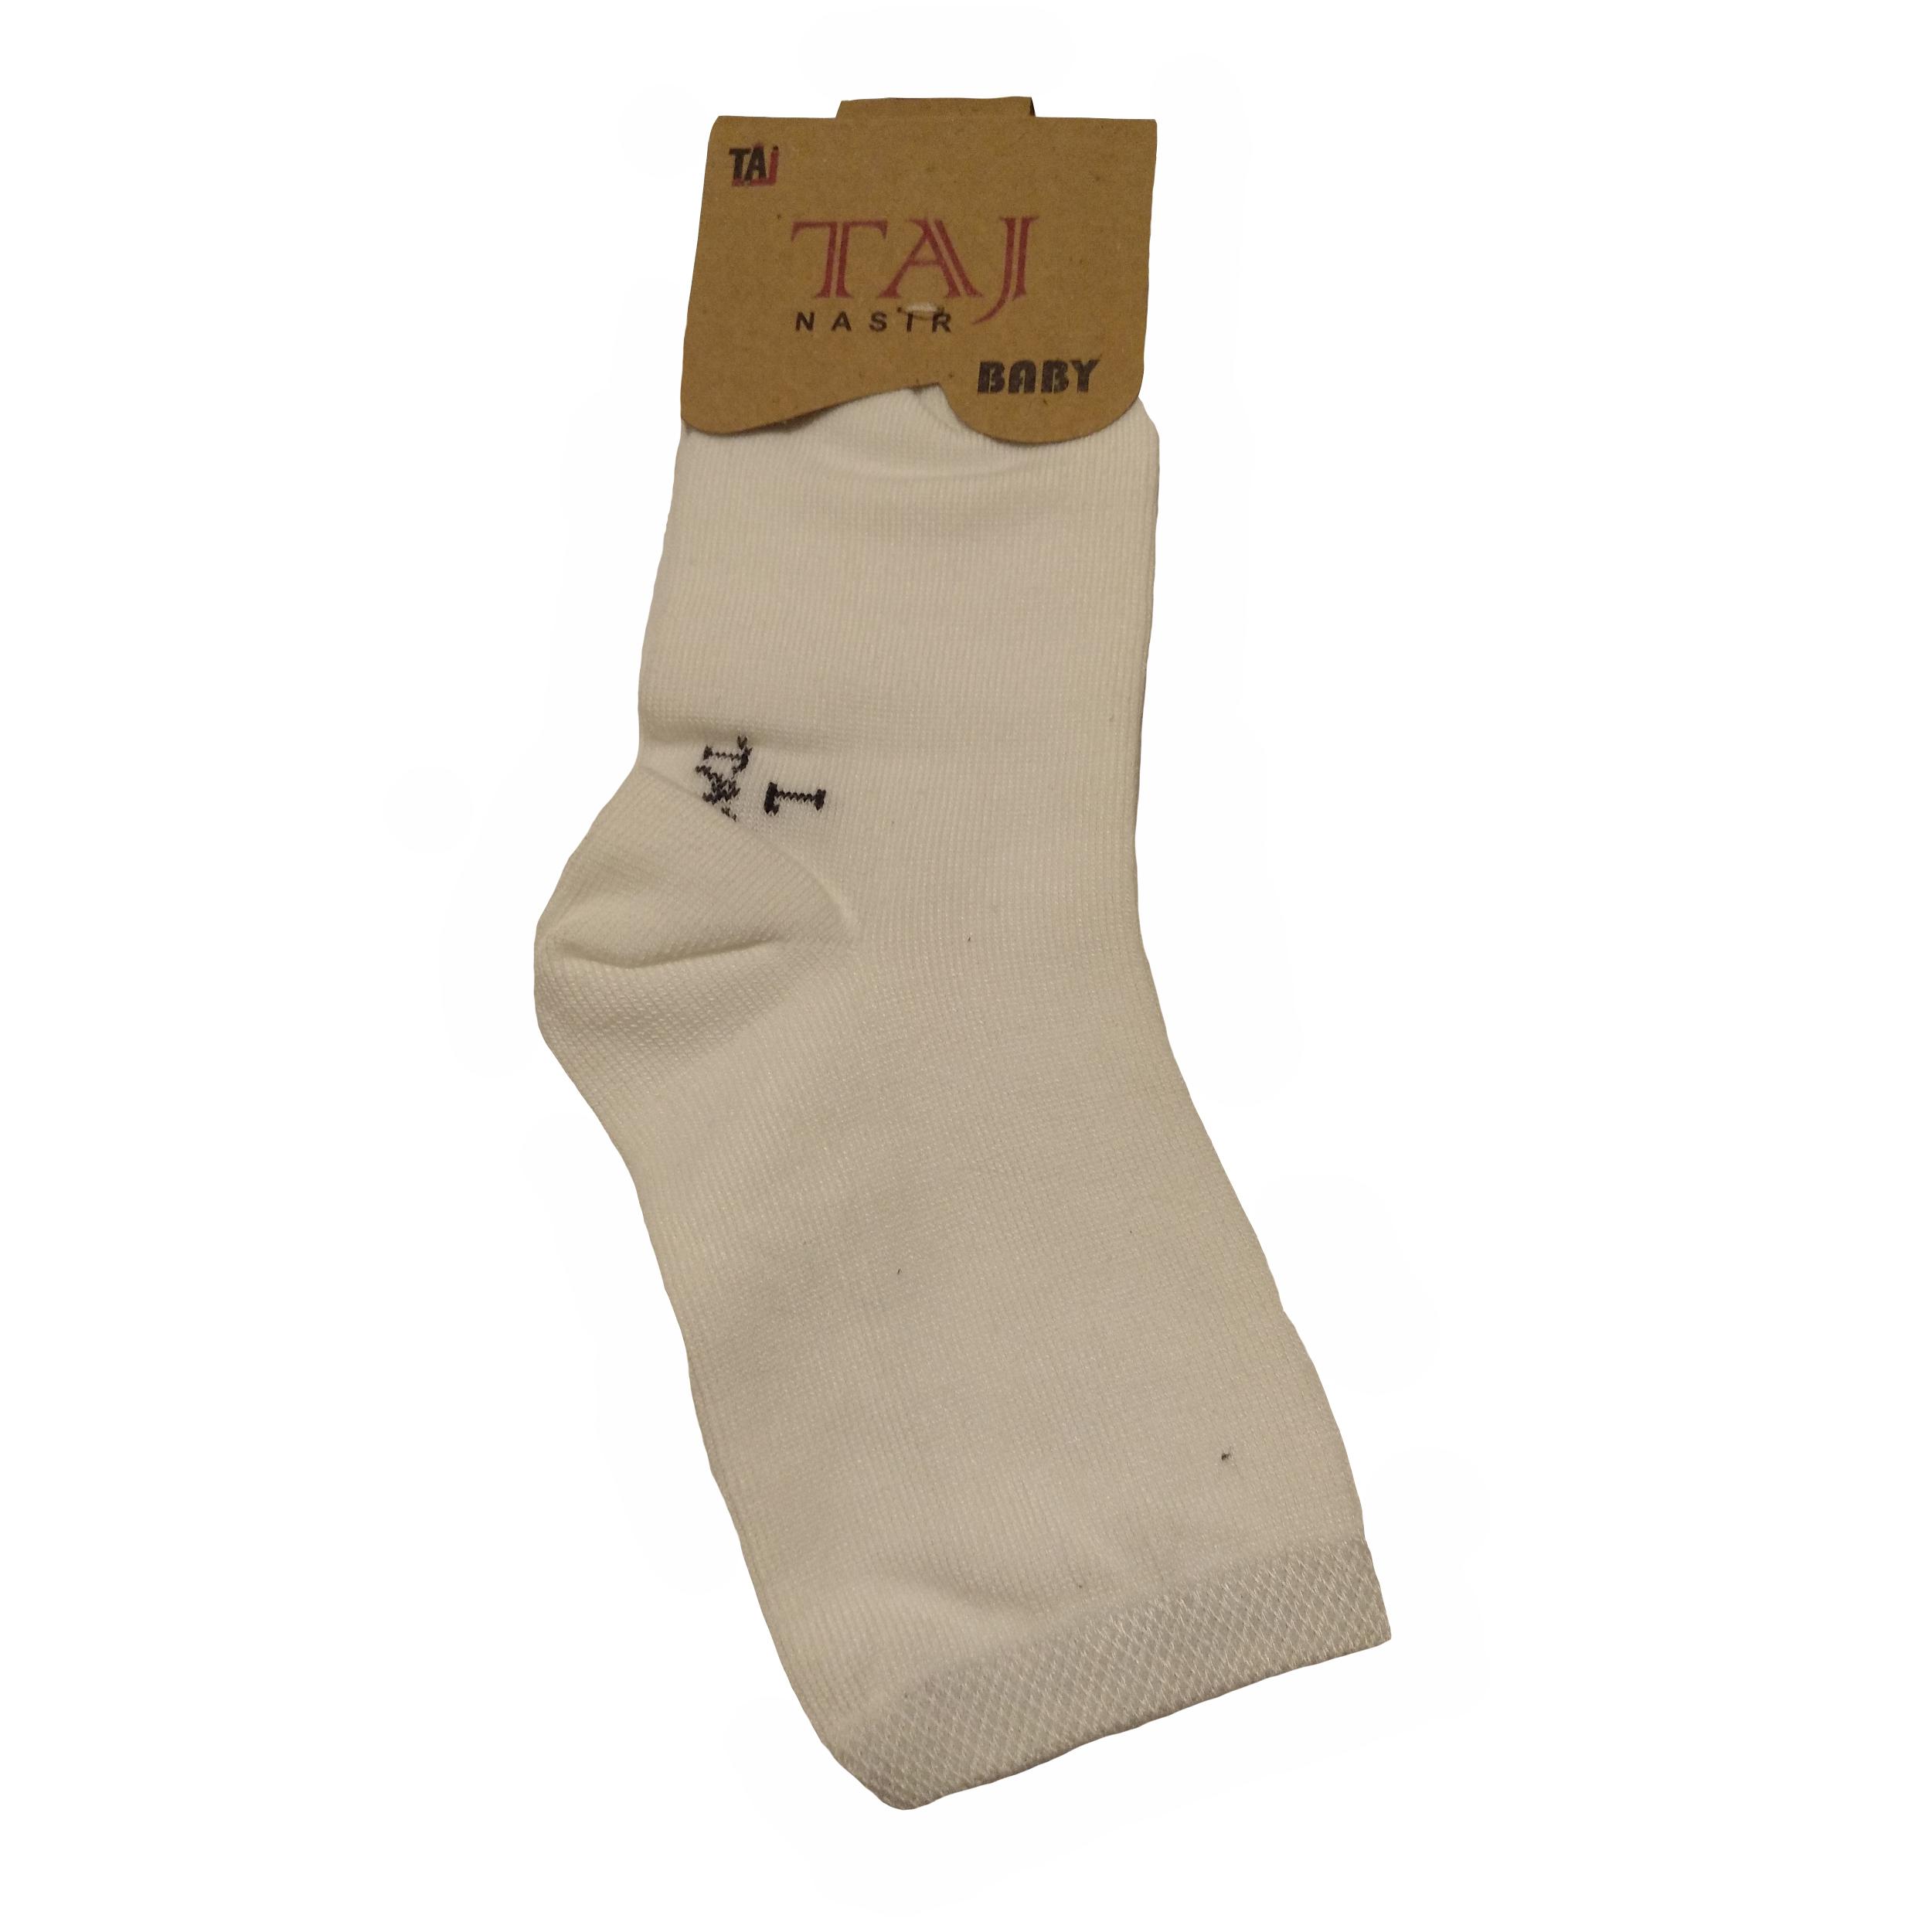 جوراب بچگانه تاج مدل P-3 -  - 3